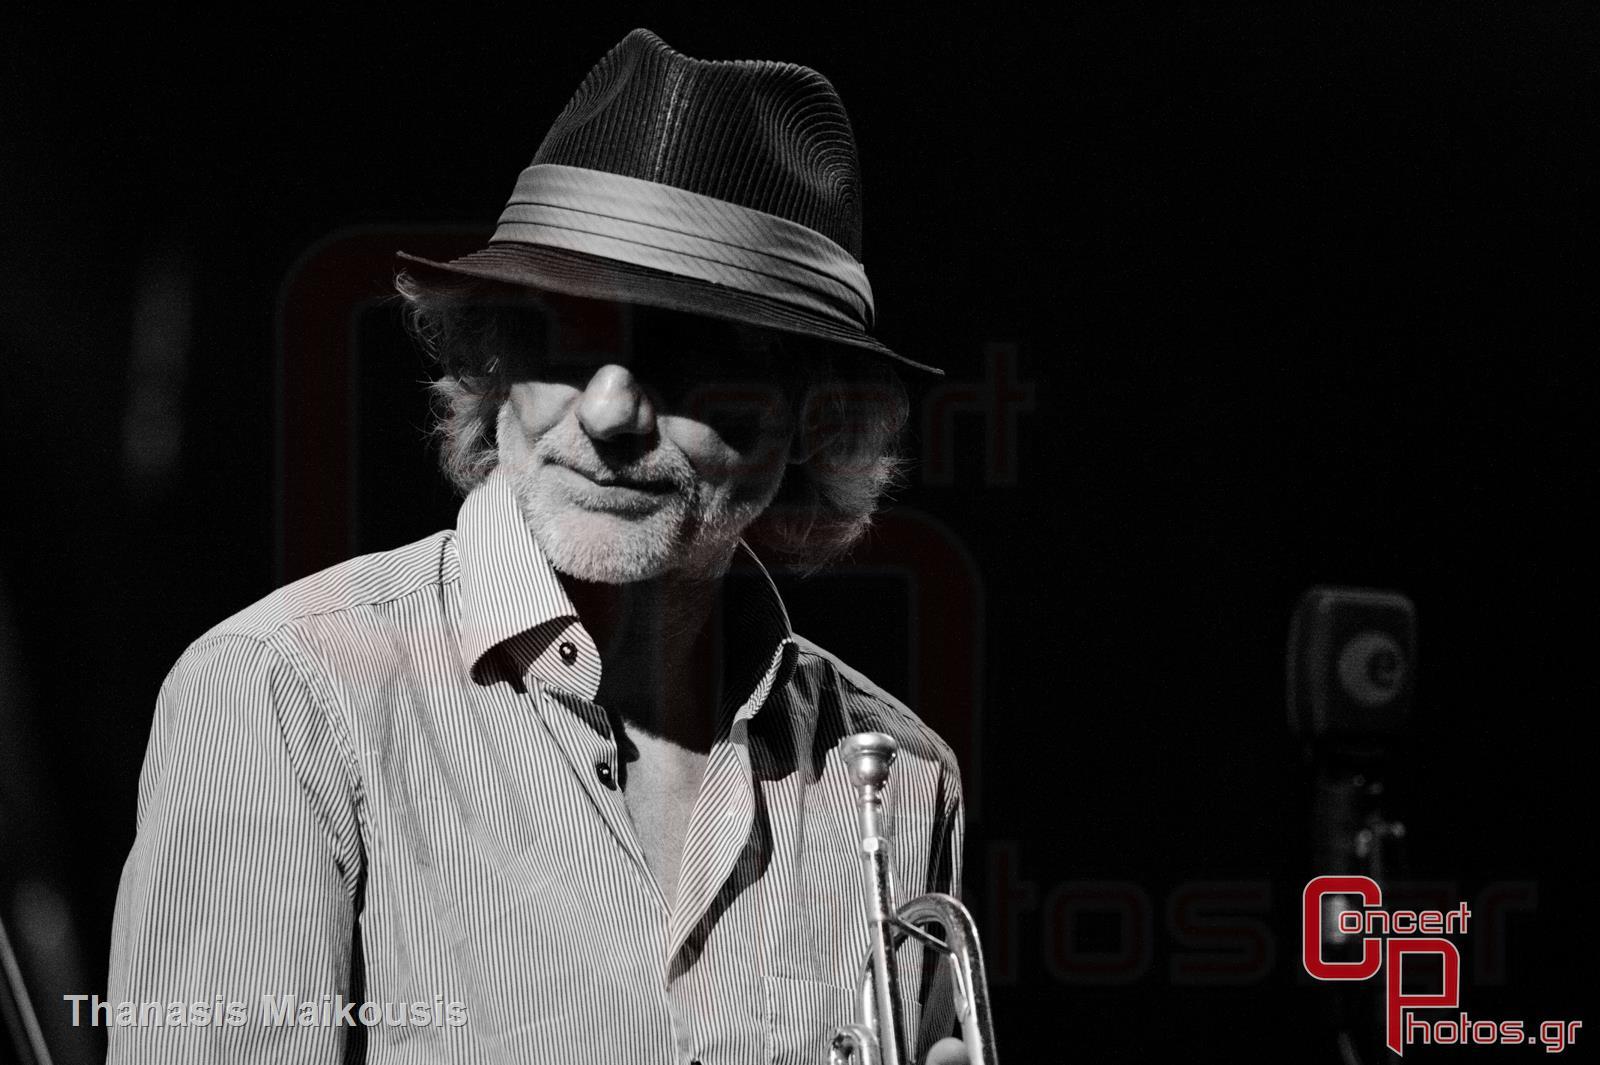 Active Member - Τραγούδα μας να φύγει το σκοτάδι- photographer: Thanasis Maikousis - concertphotos_-5432